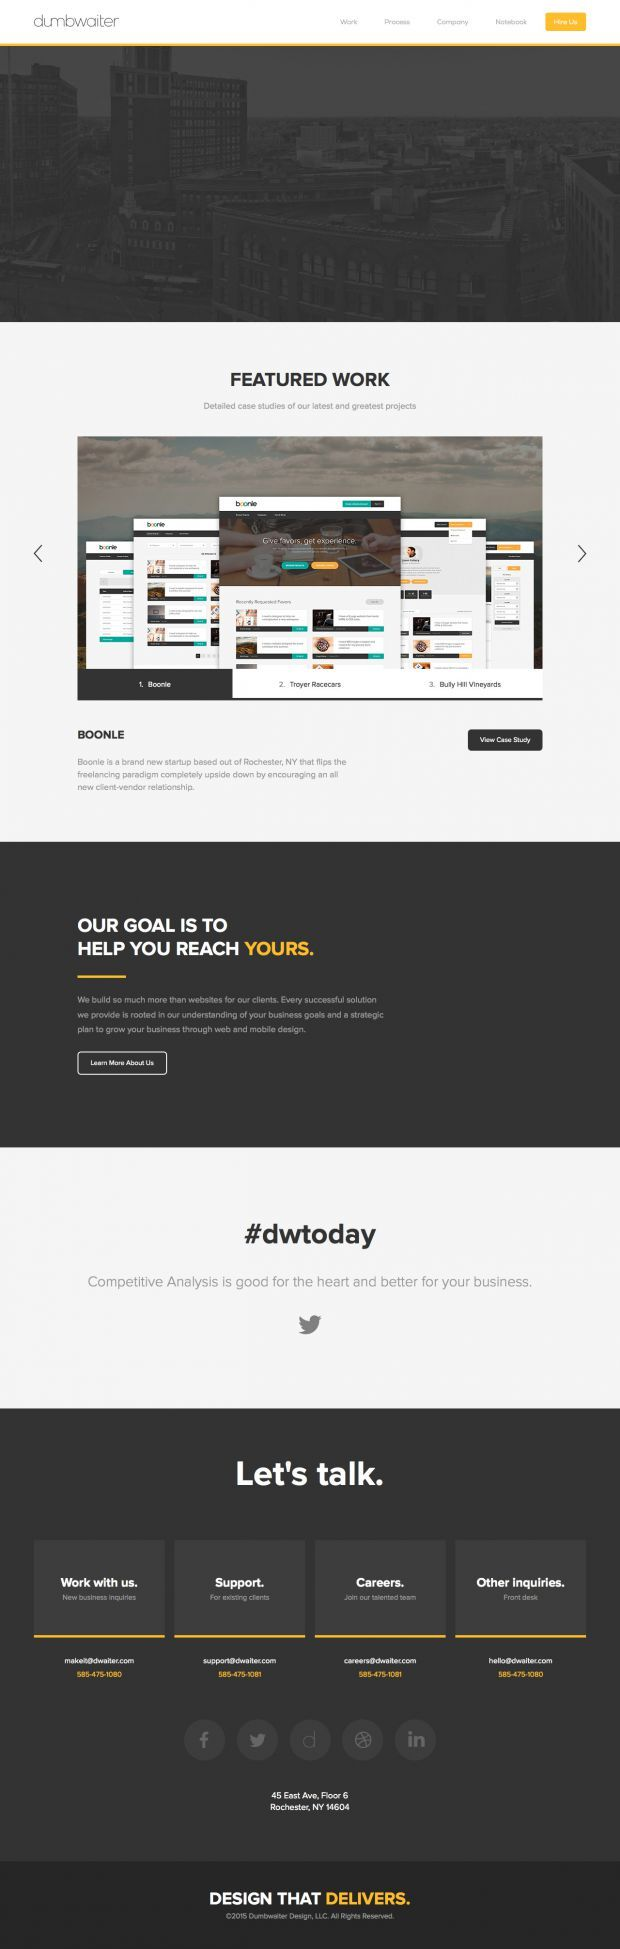 Dumbwaiter - A Full-Service Web Design and Development Firm www.niceoneilike.com #Agency, #Studio, #Responsive #Design, #jQuery, #Development, #Creative, #Inspiration, #Scrolling #Site, #Design